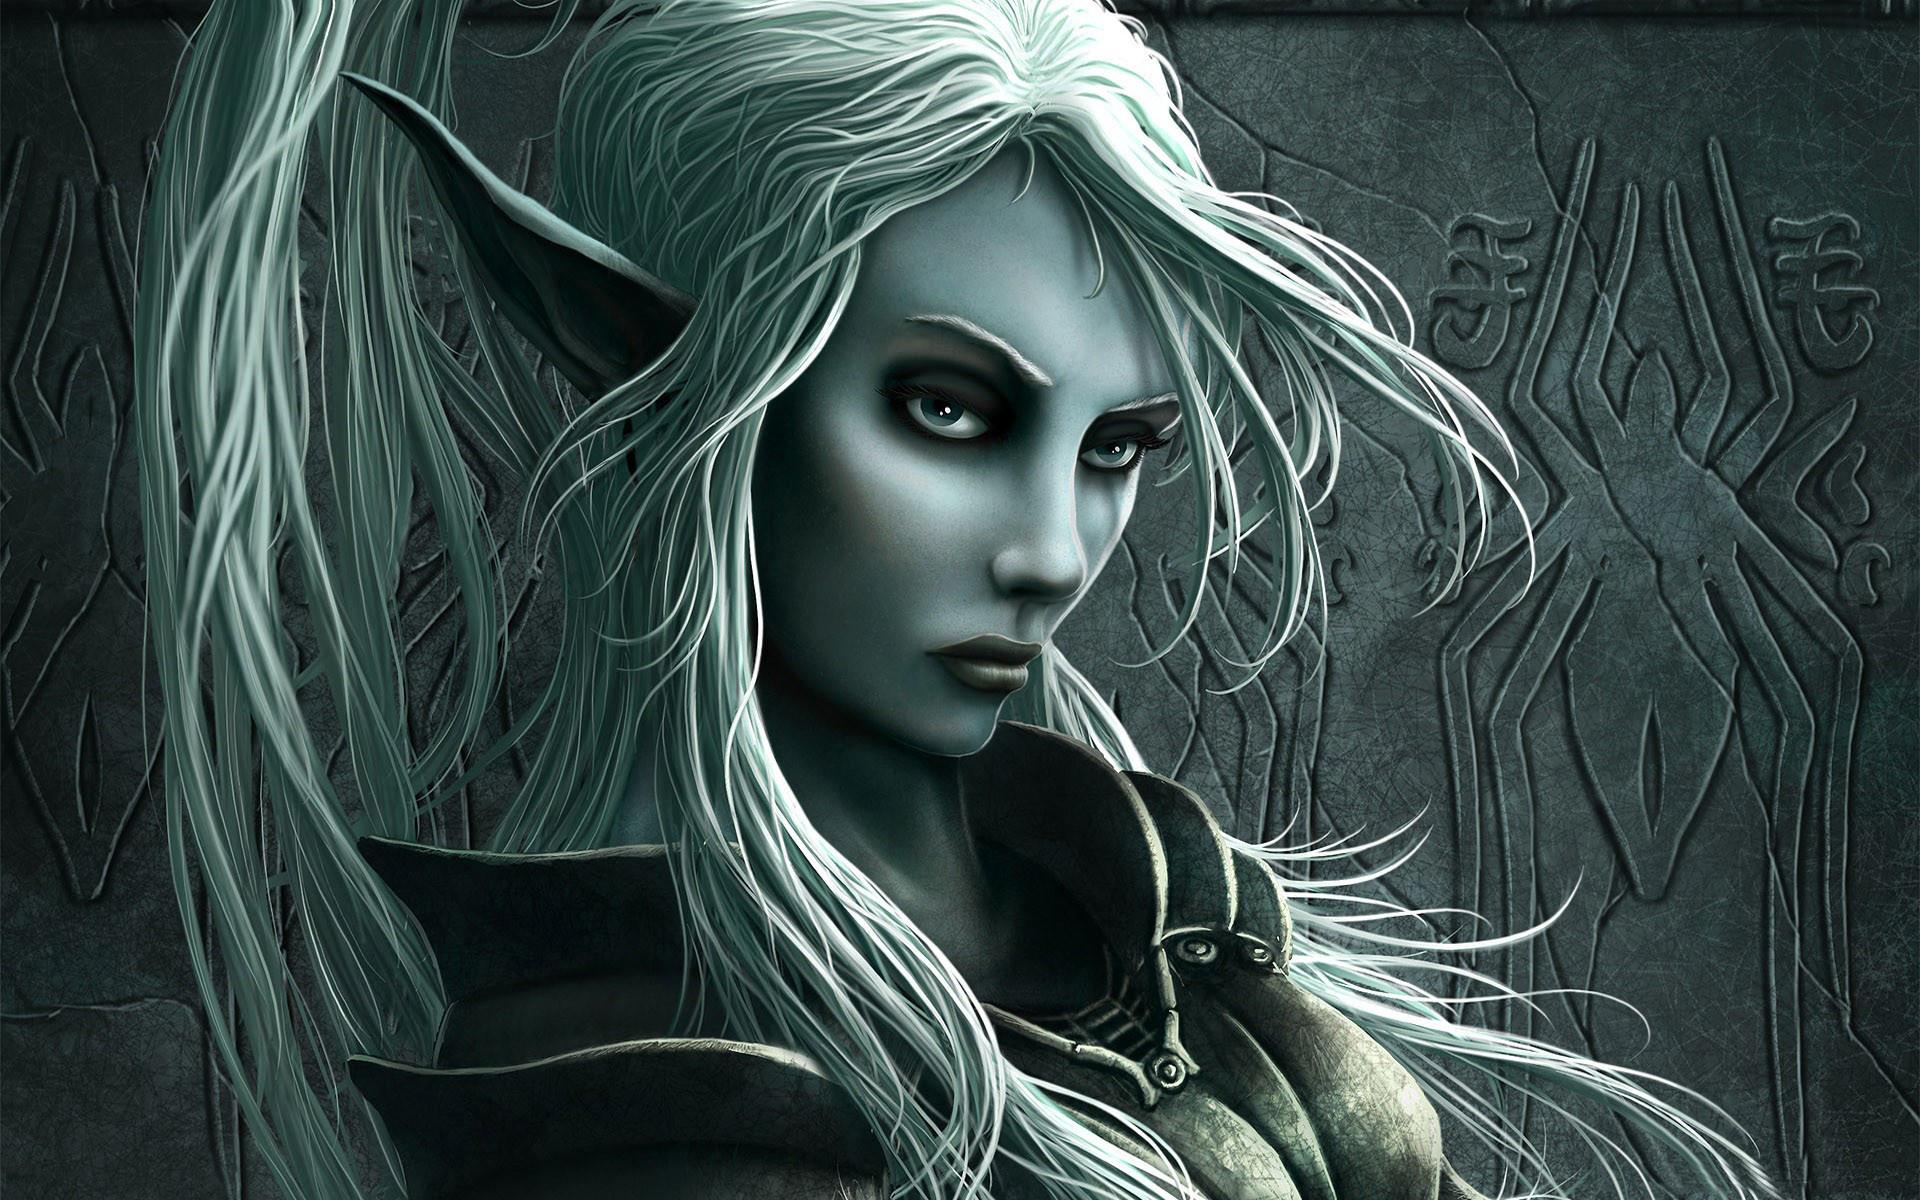 Elf woman wallpapers   Elf woman stock photos